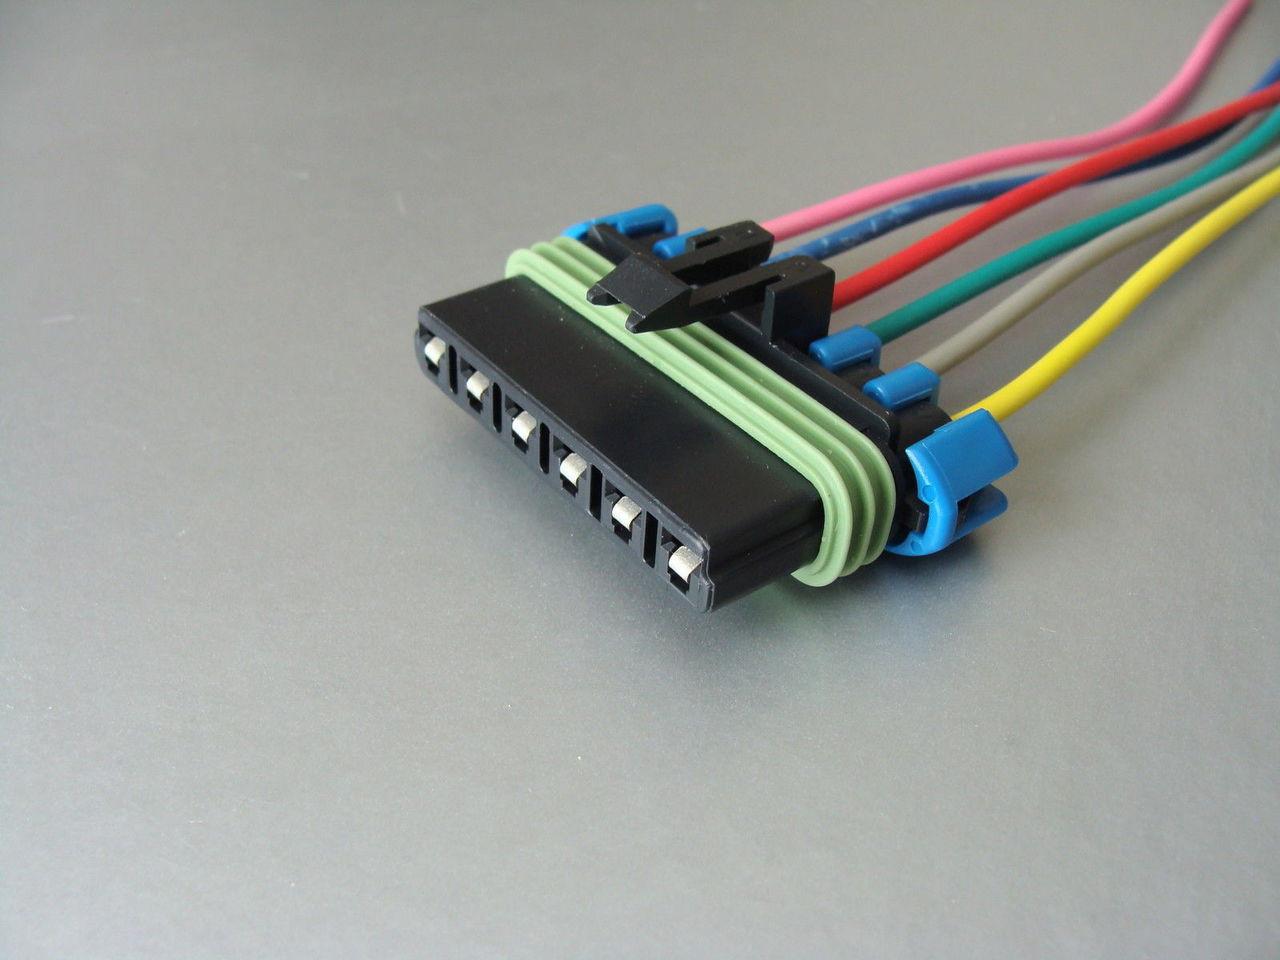 windshield wiper motor connector 88 92 camaro firebird image 1 [ 1280 x 960 Pixel ]